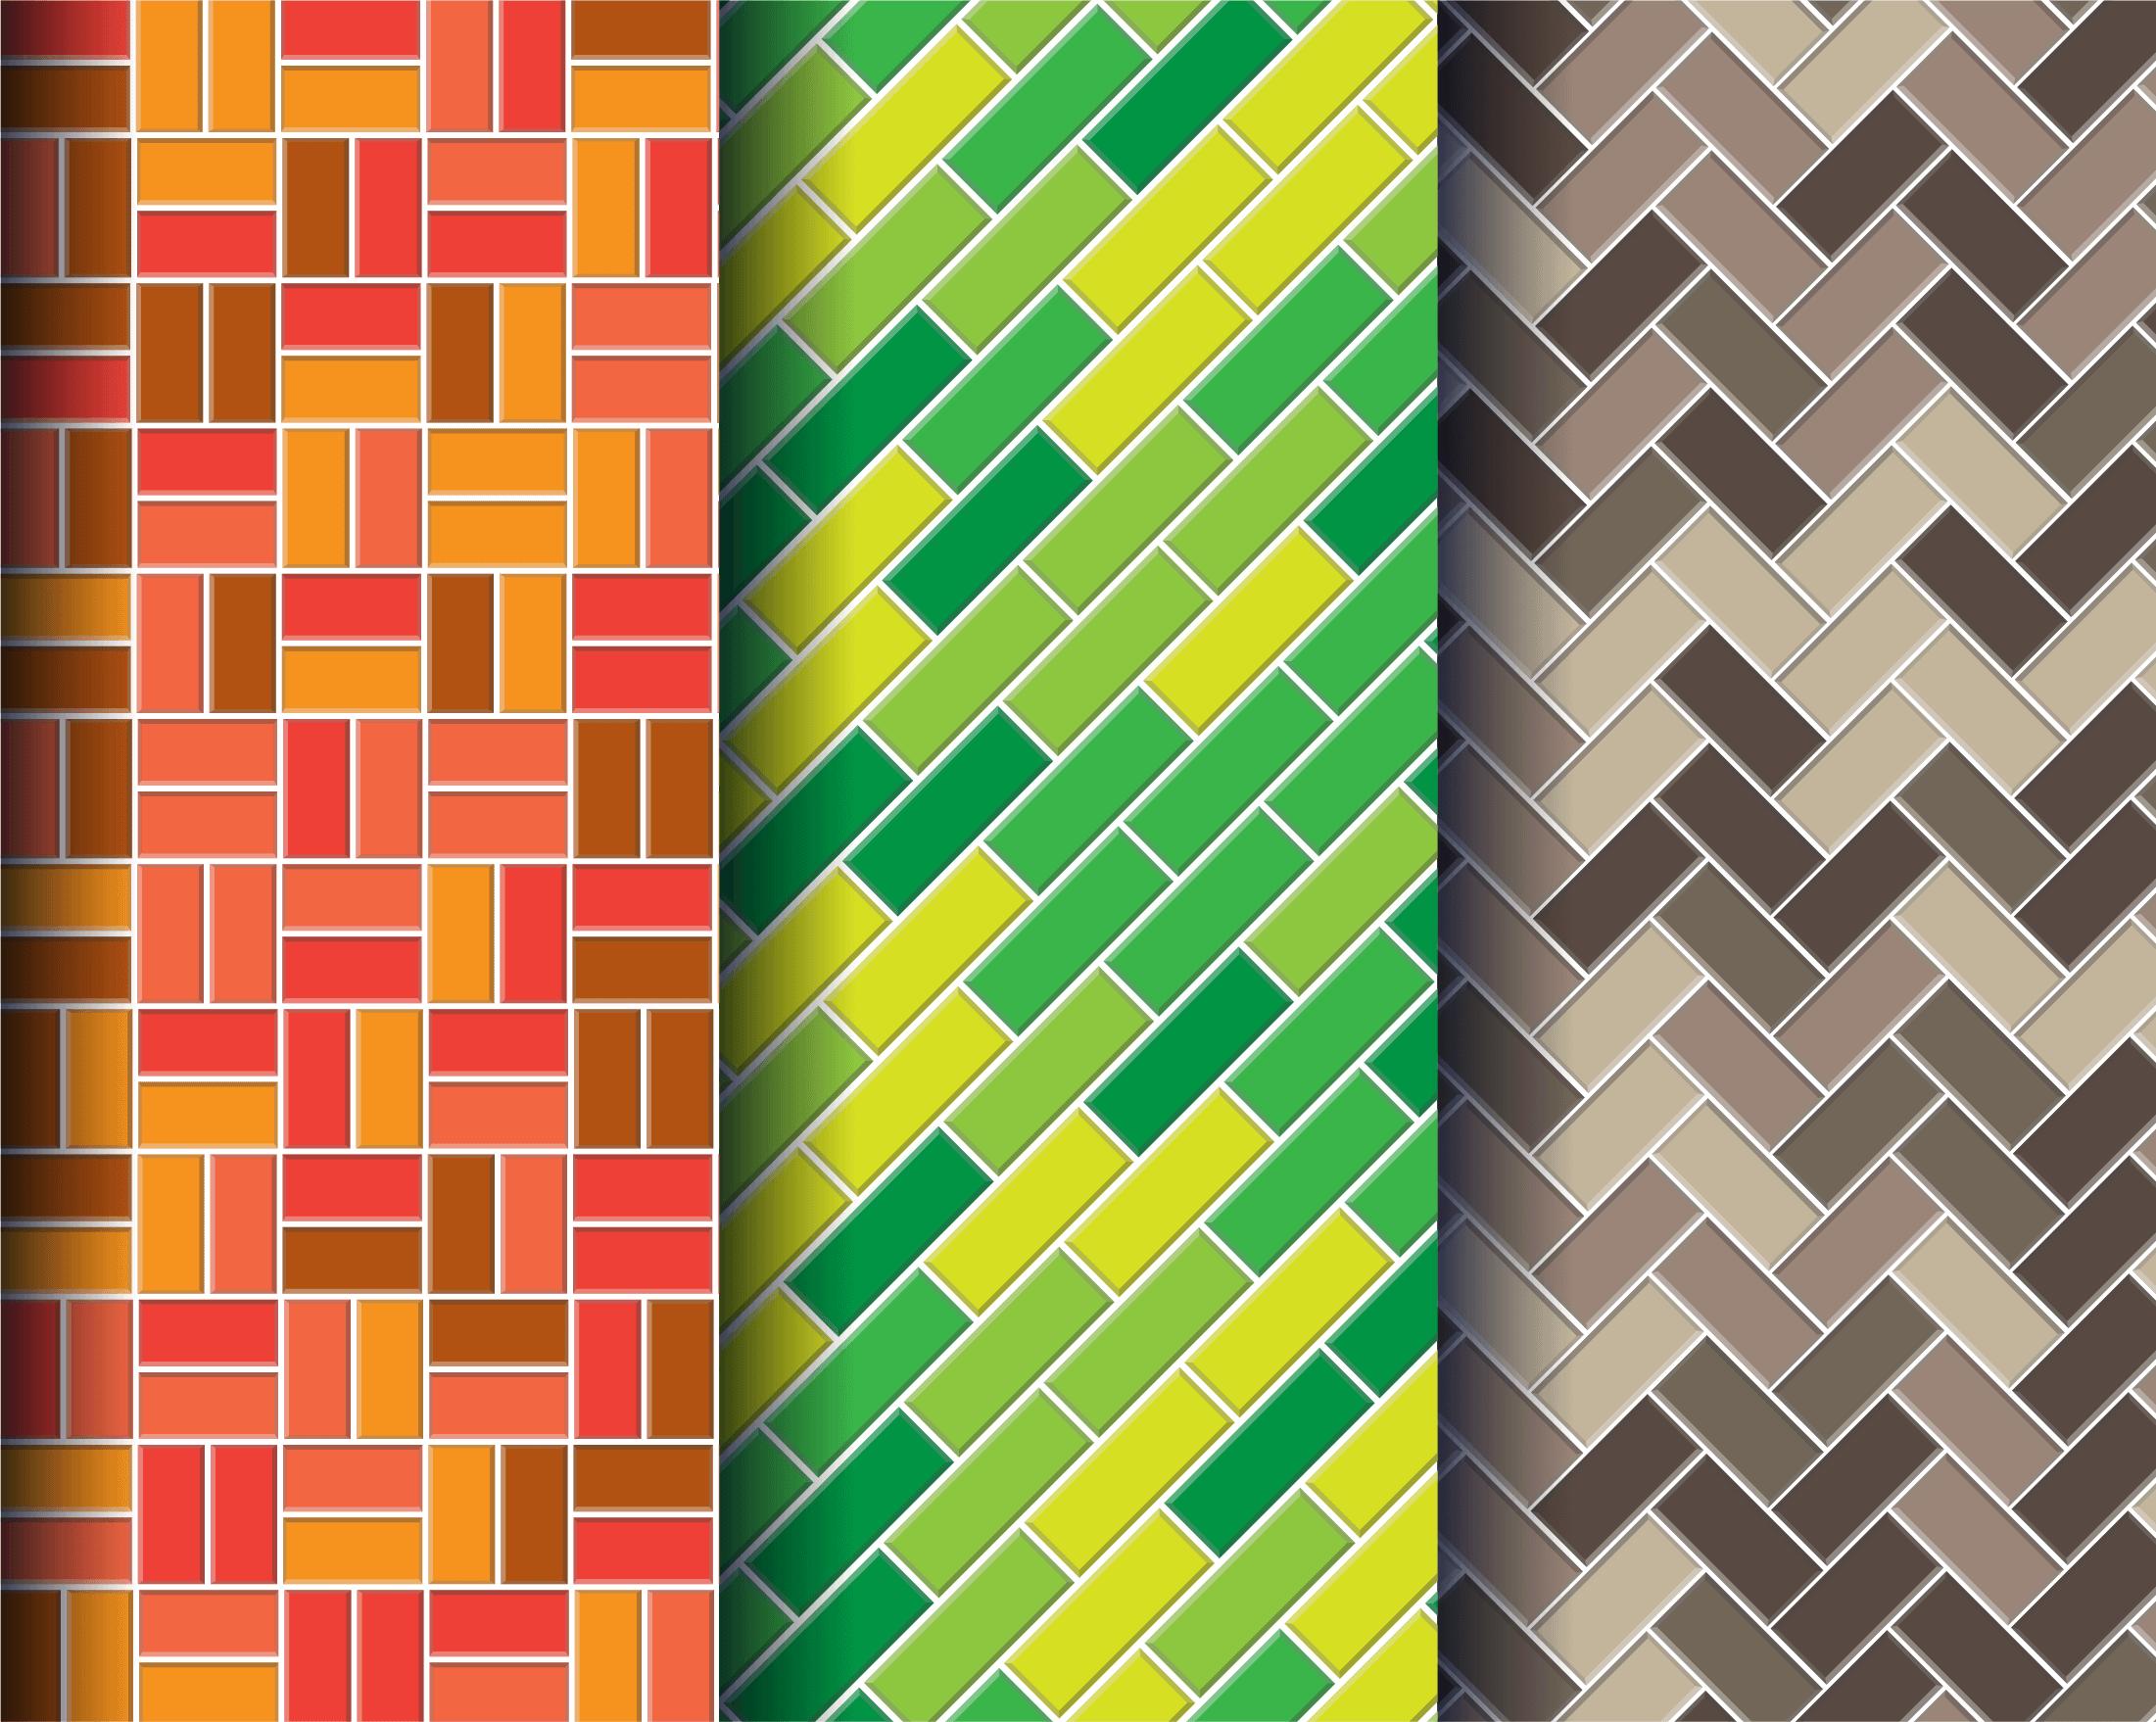 Colorful brick wall patterns